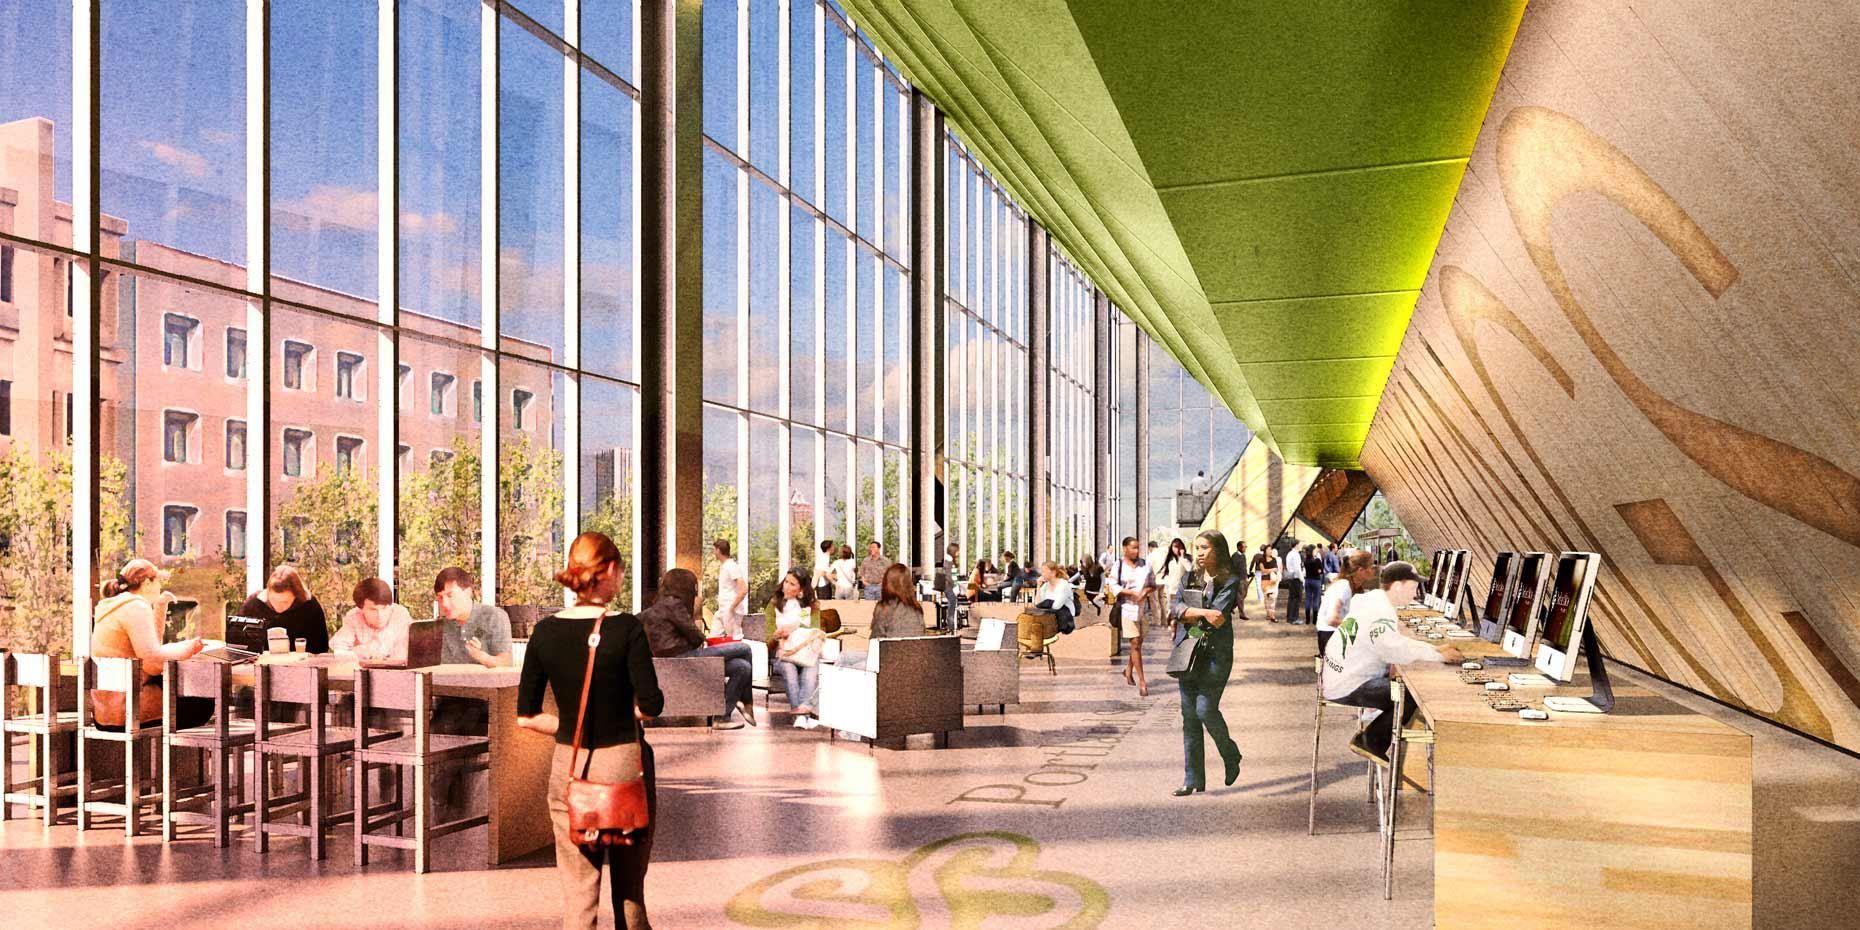 npr-viking-pavilion-05 - Ronen Bekerman - 3D Architectural Visualization & Rendering Blog